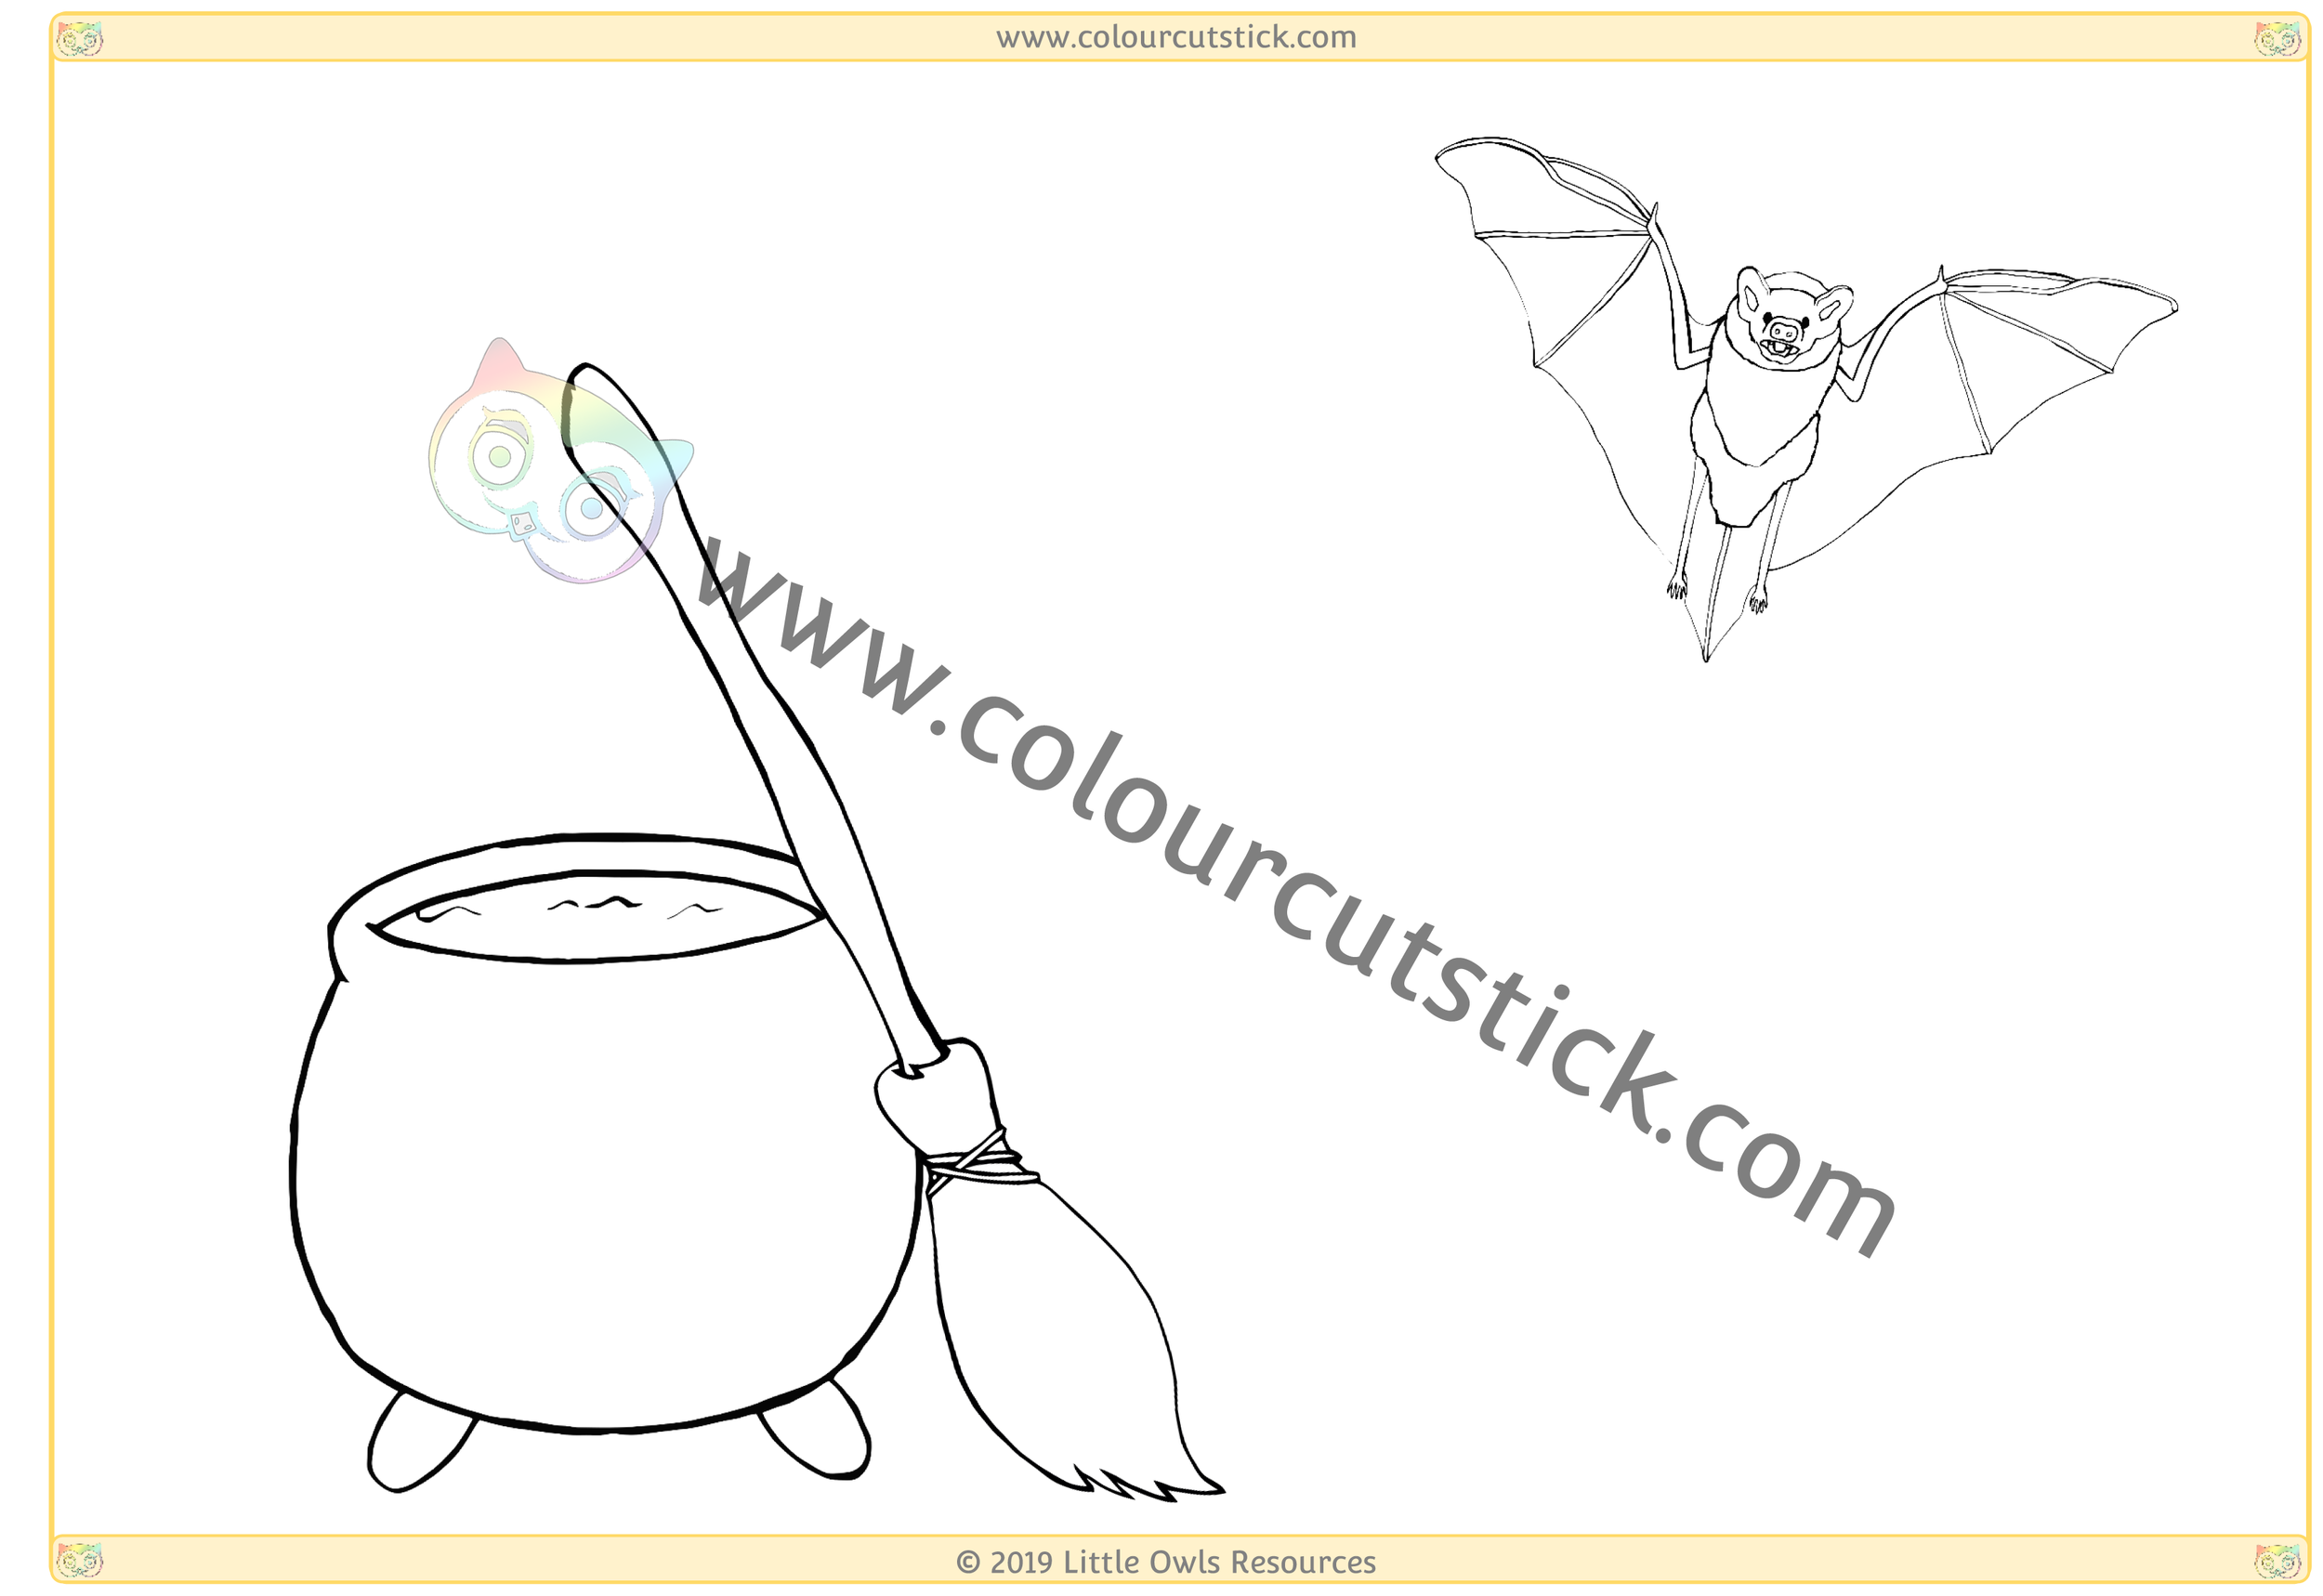 Witch's Cauldron, Broom and Bat -